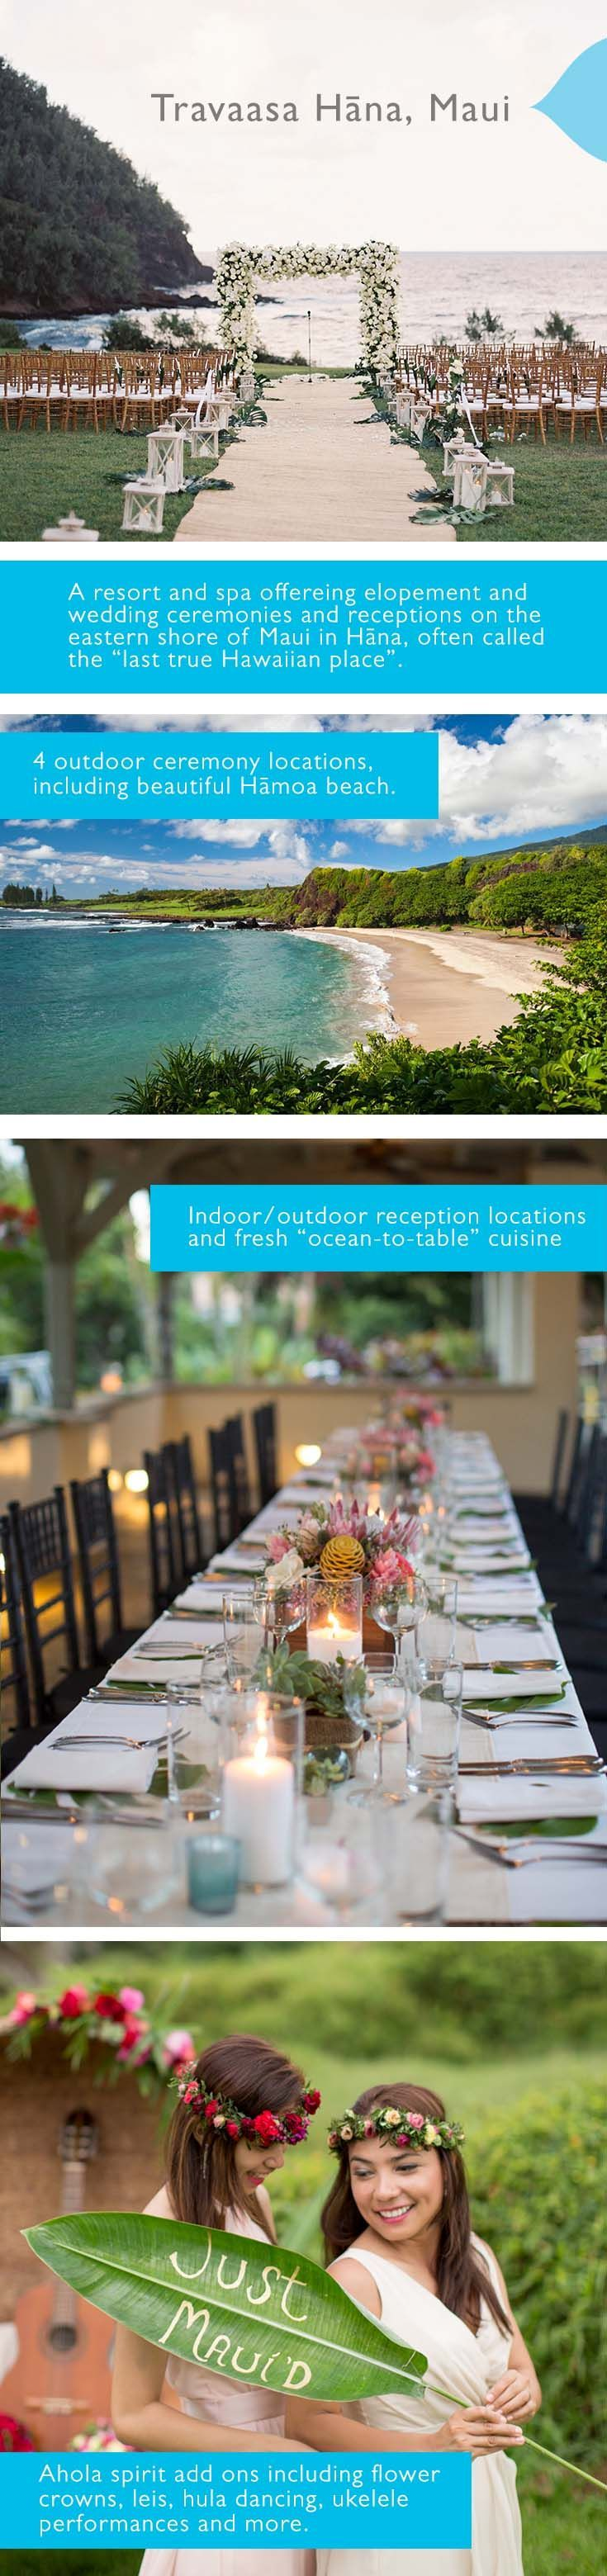 Travaasa Hana, Maui is a full-service resort wedding venue in Hana, Maui, Hawaii. From intimate elopement ceremonies to grand luau wedding celebrations, the lush tropical landscape, pristine beaches, and authentic aloha spirit make Travaasa an ideal venue for a magical Hawaii wedding. Photos courtesy of josevilla.com & http://kauaweddingphotography.com/